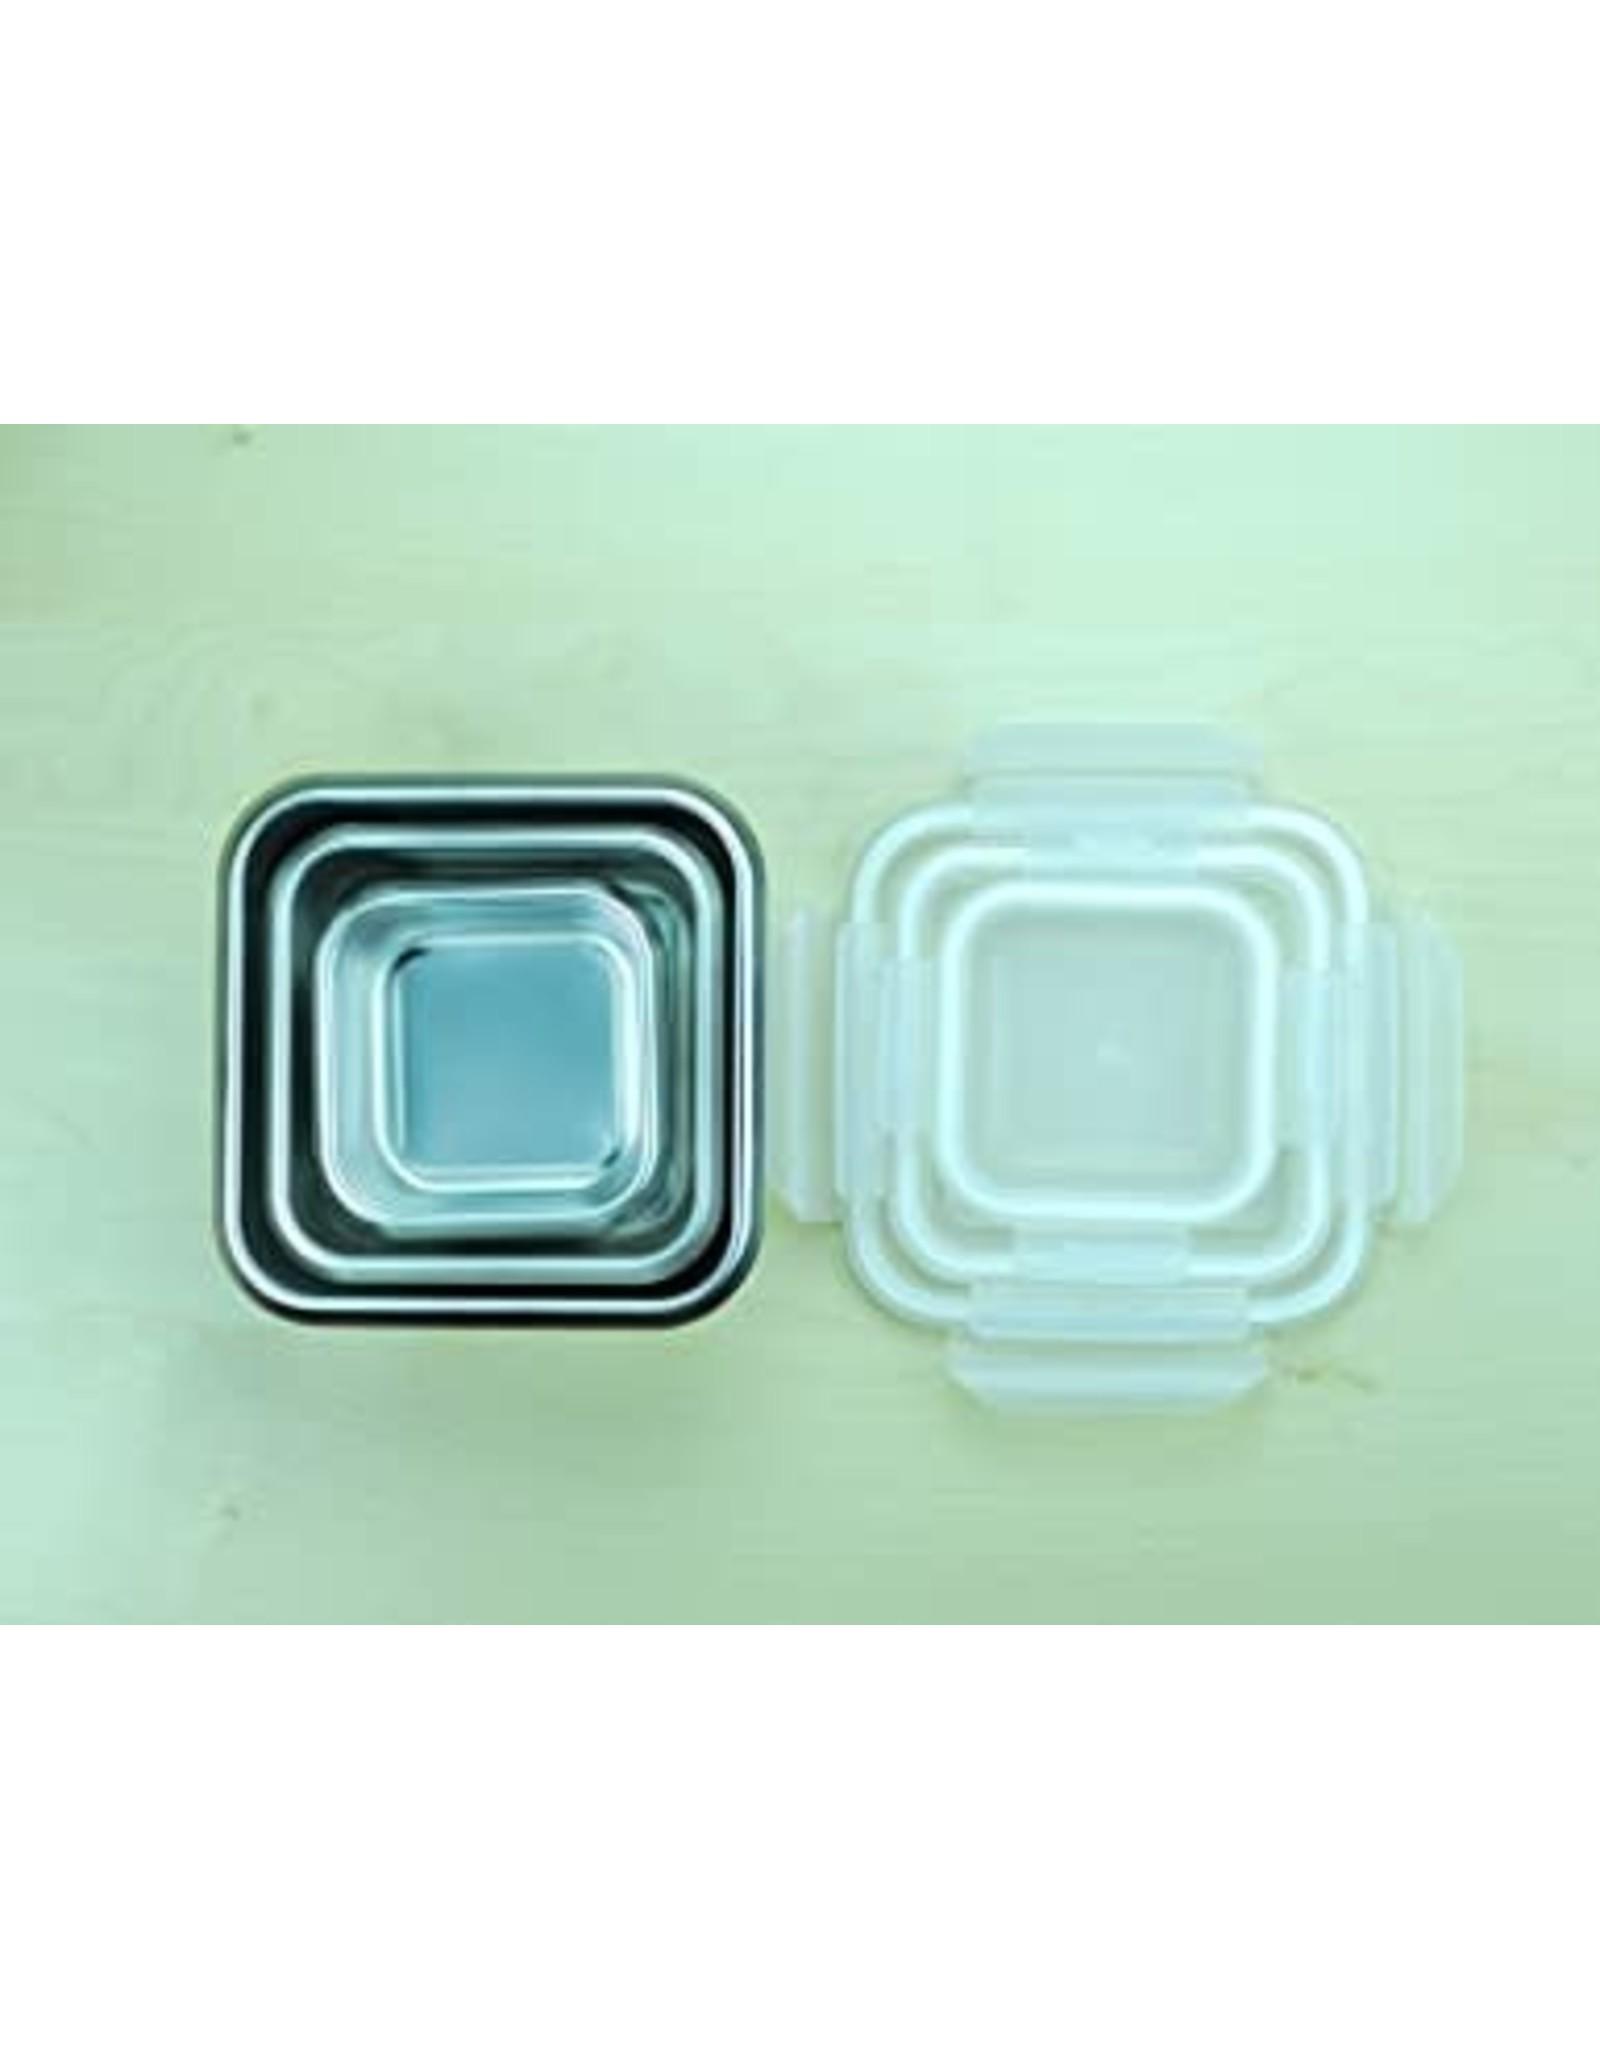 Minimal Nexten Minimal Rectangular S/S Container 500mL